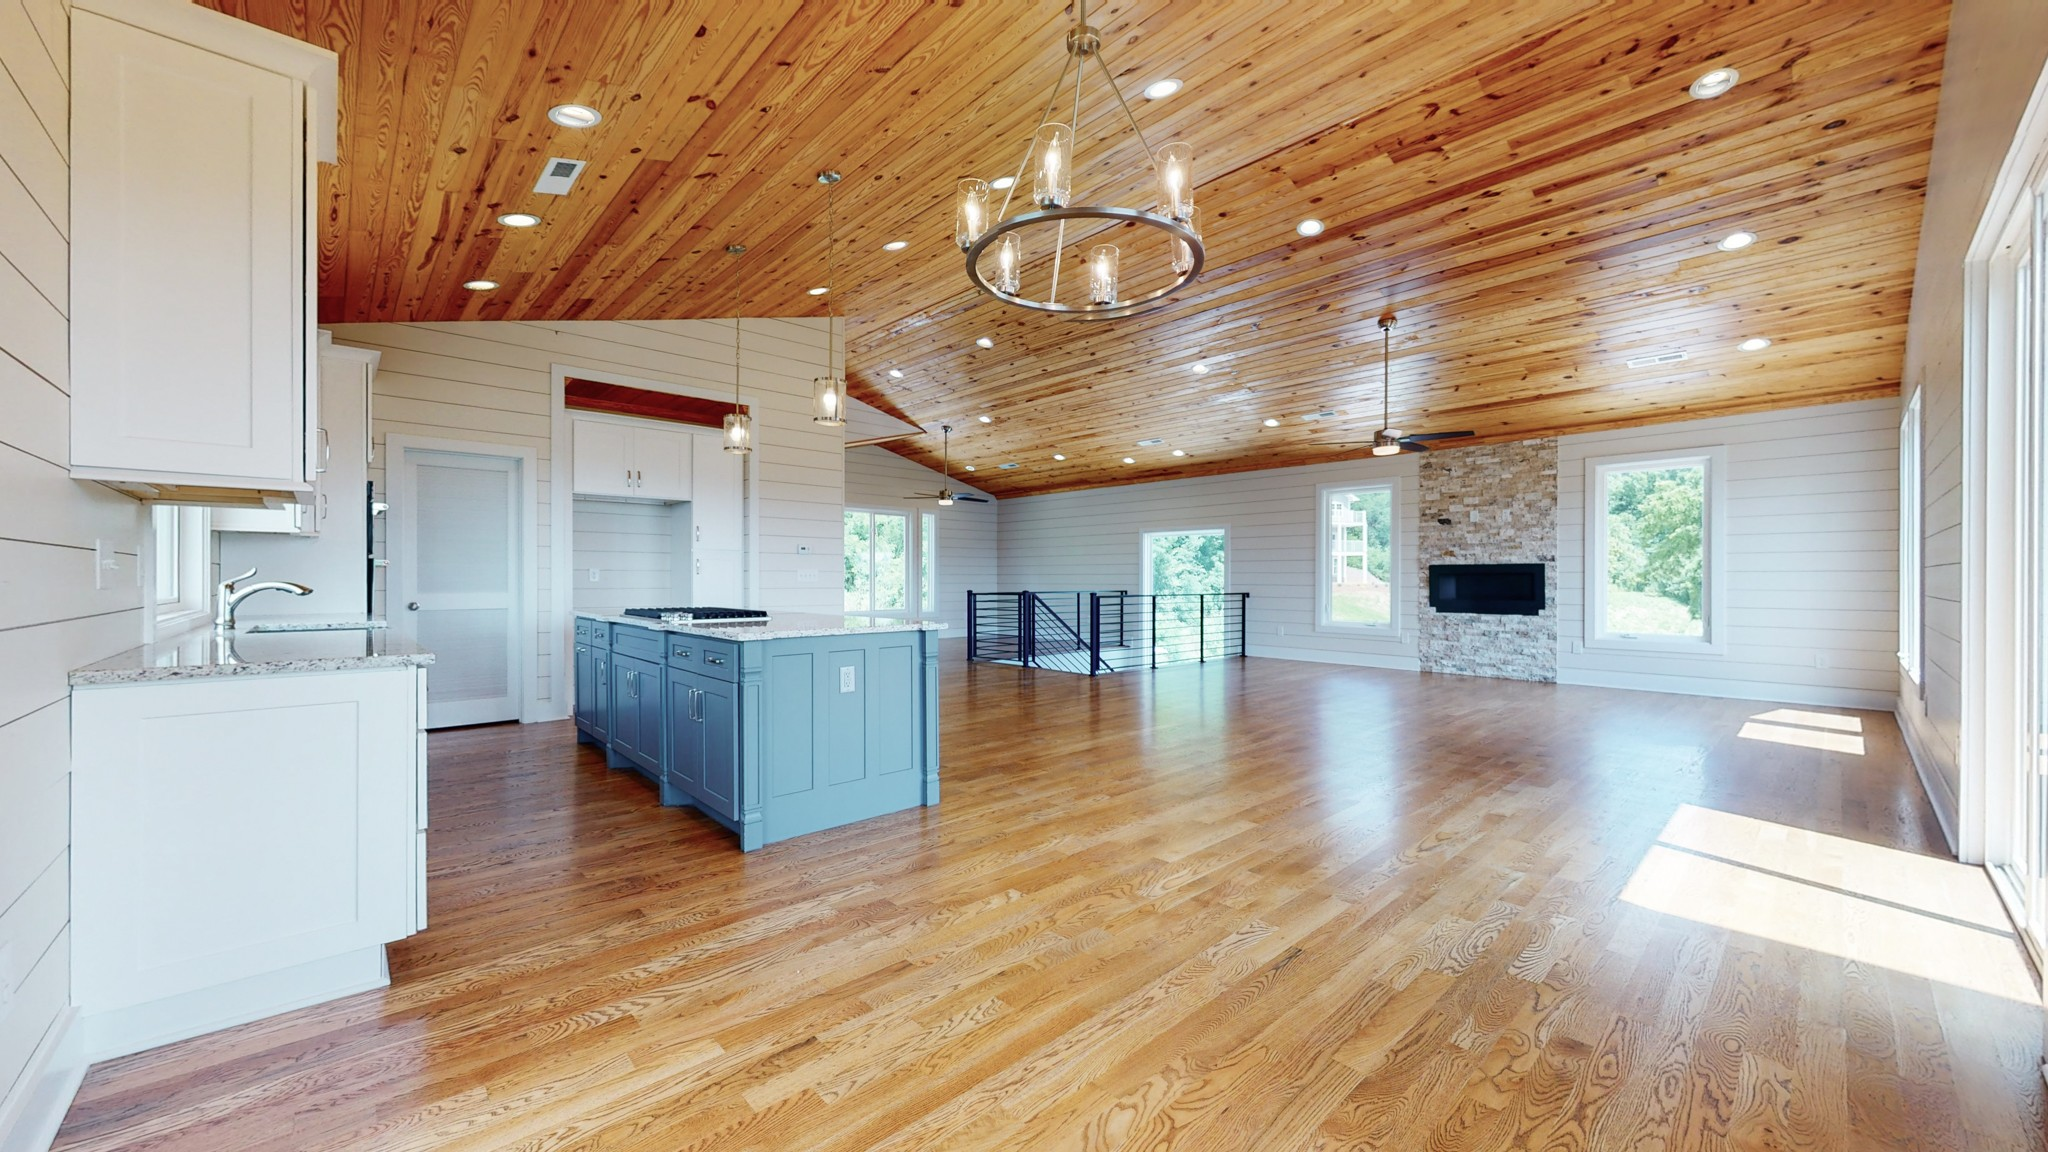 314 High Bridge Dr Property Photo - Smithville, TN real estate listing